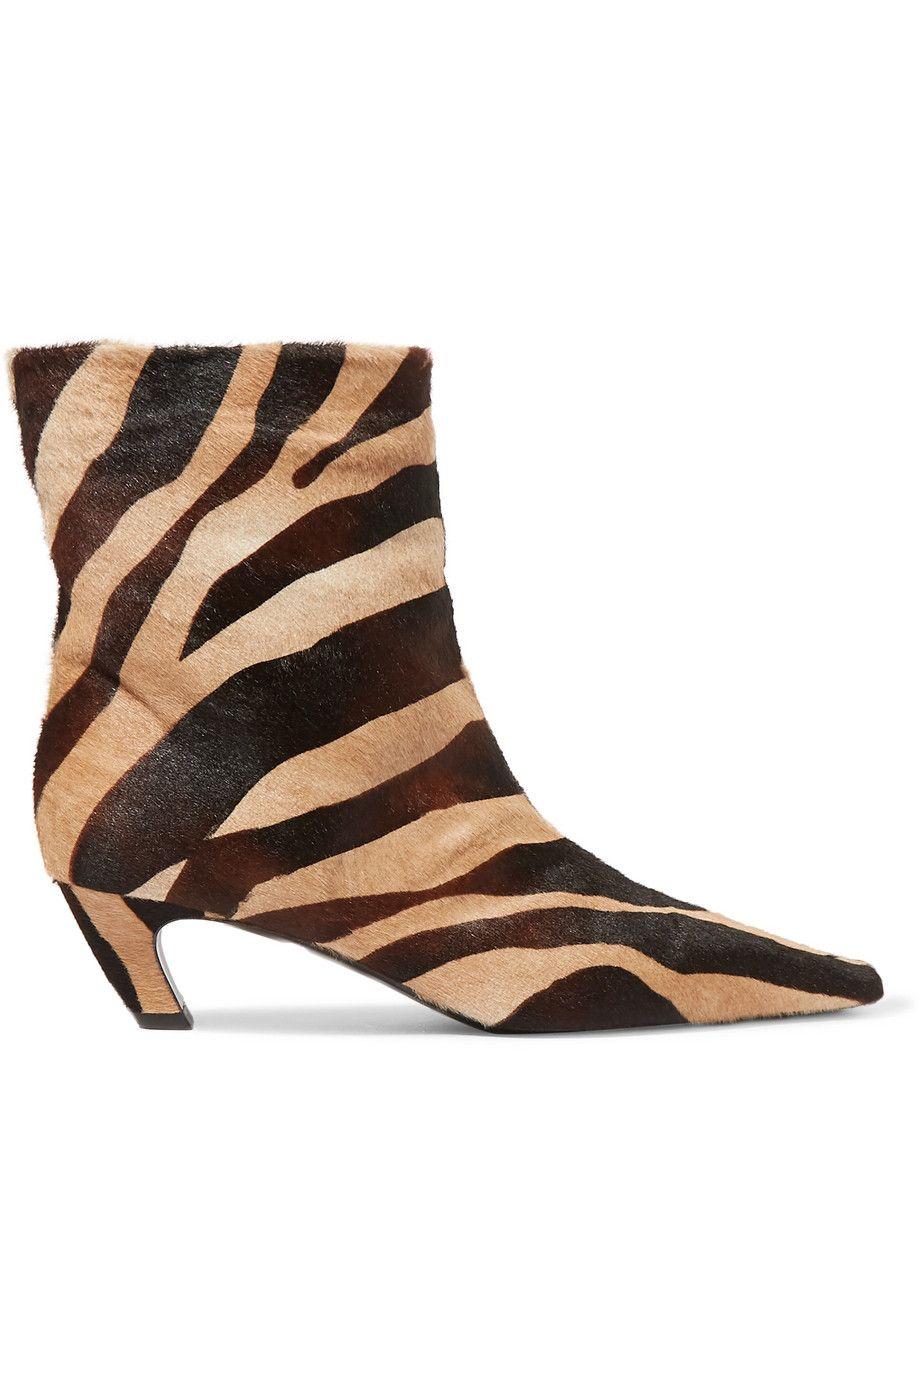 good shoe sites online